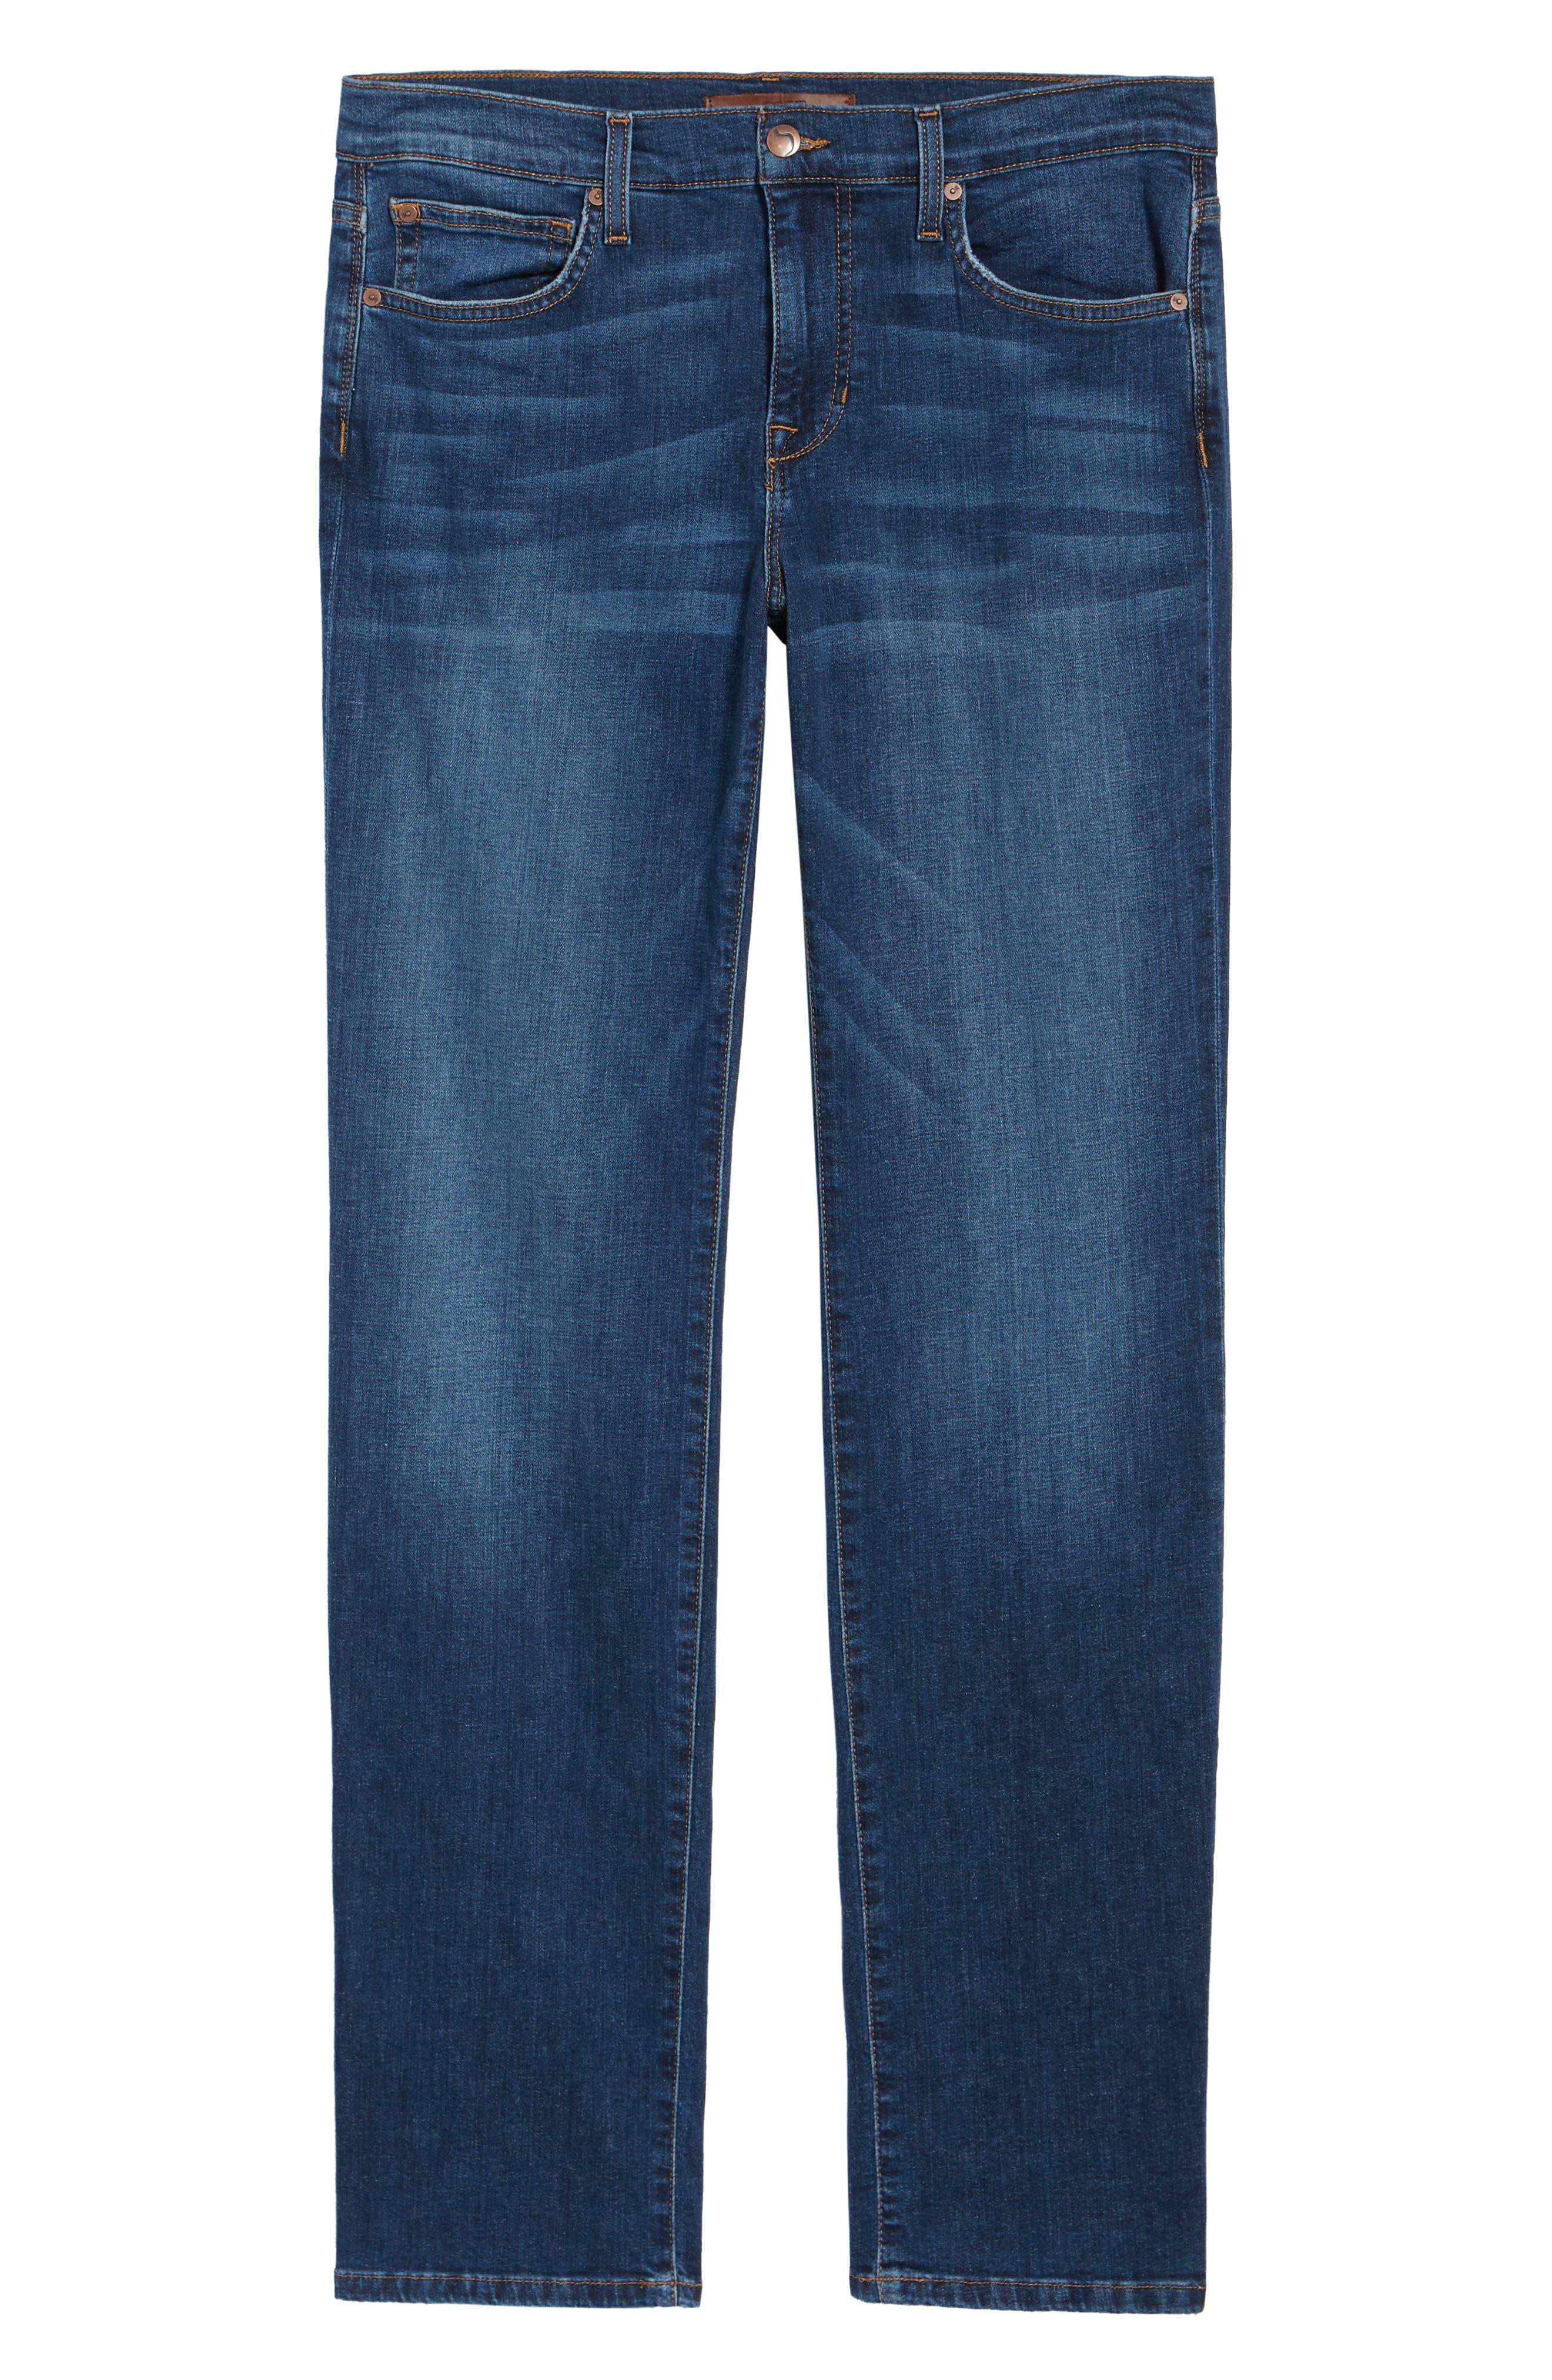 Brixton Slim Straight Leg Jeans,                             Alternate thumbnail 6, color,                             Bradlee